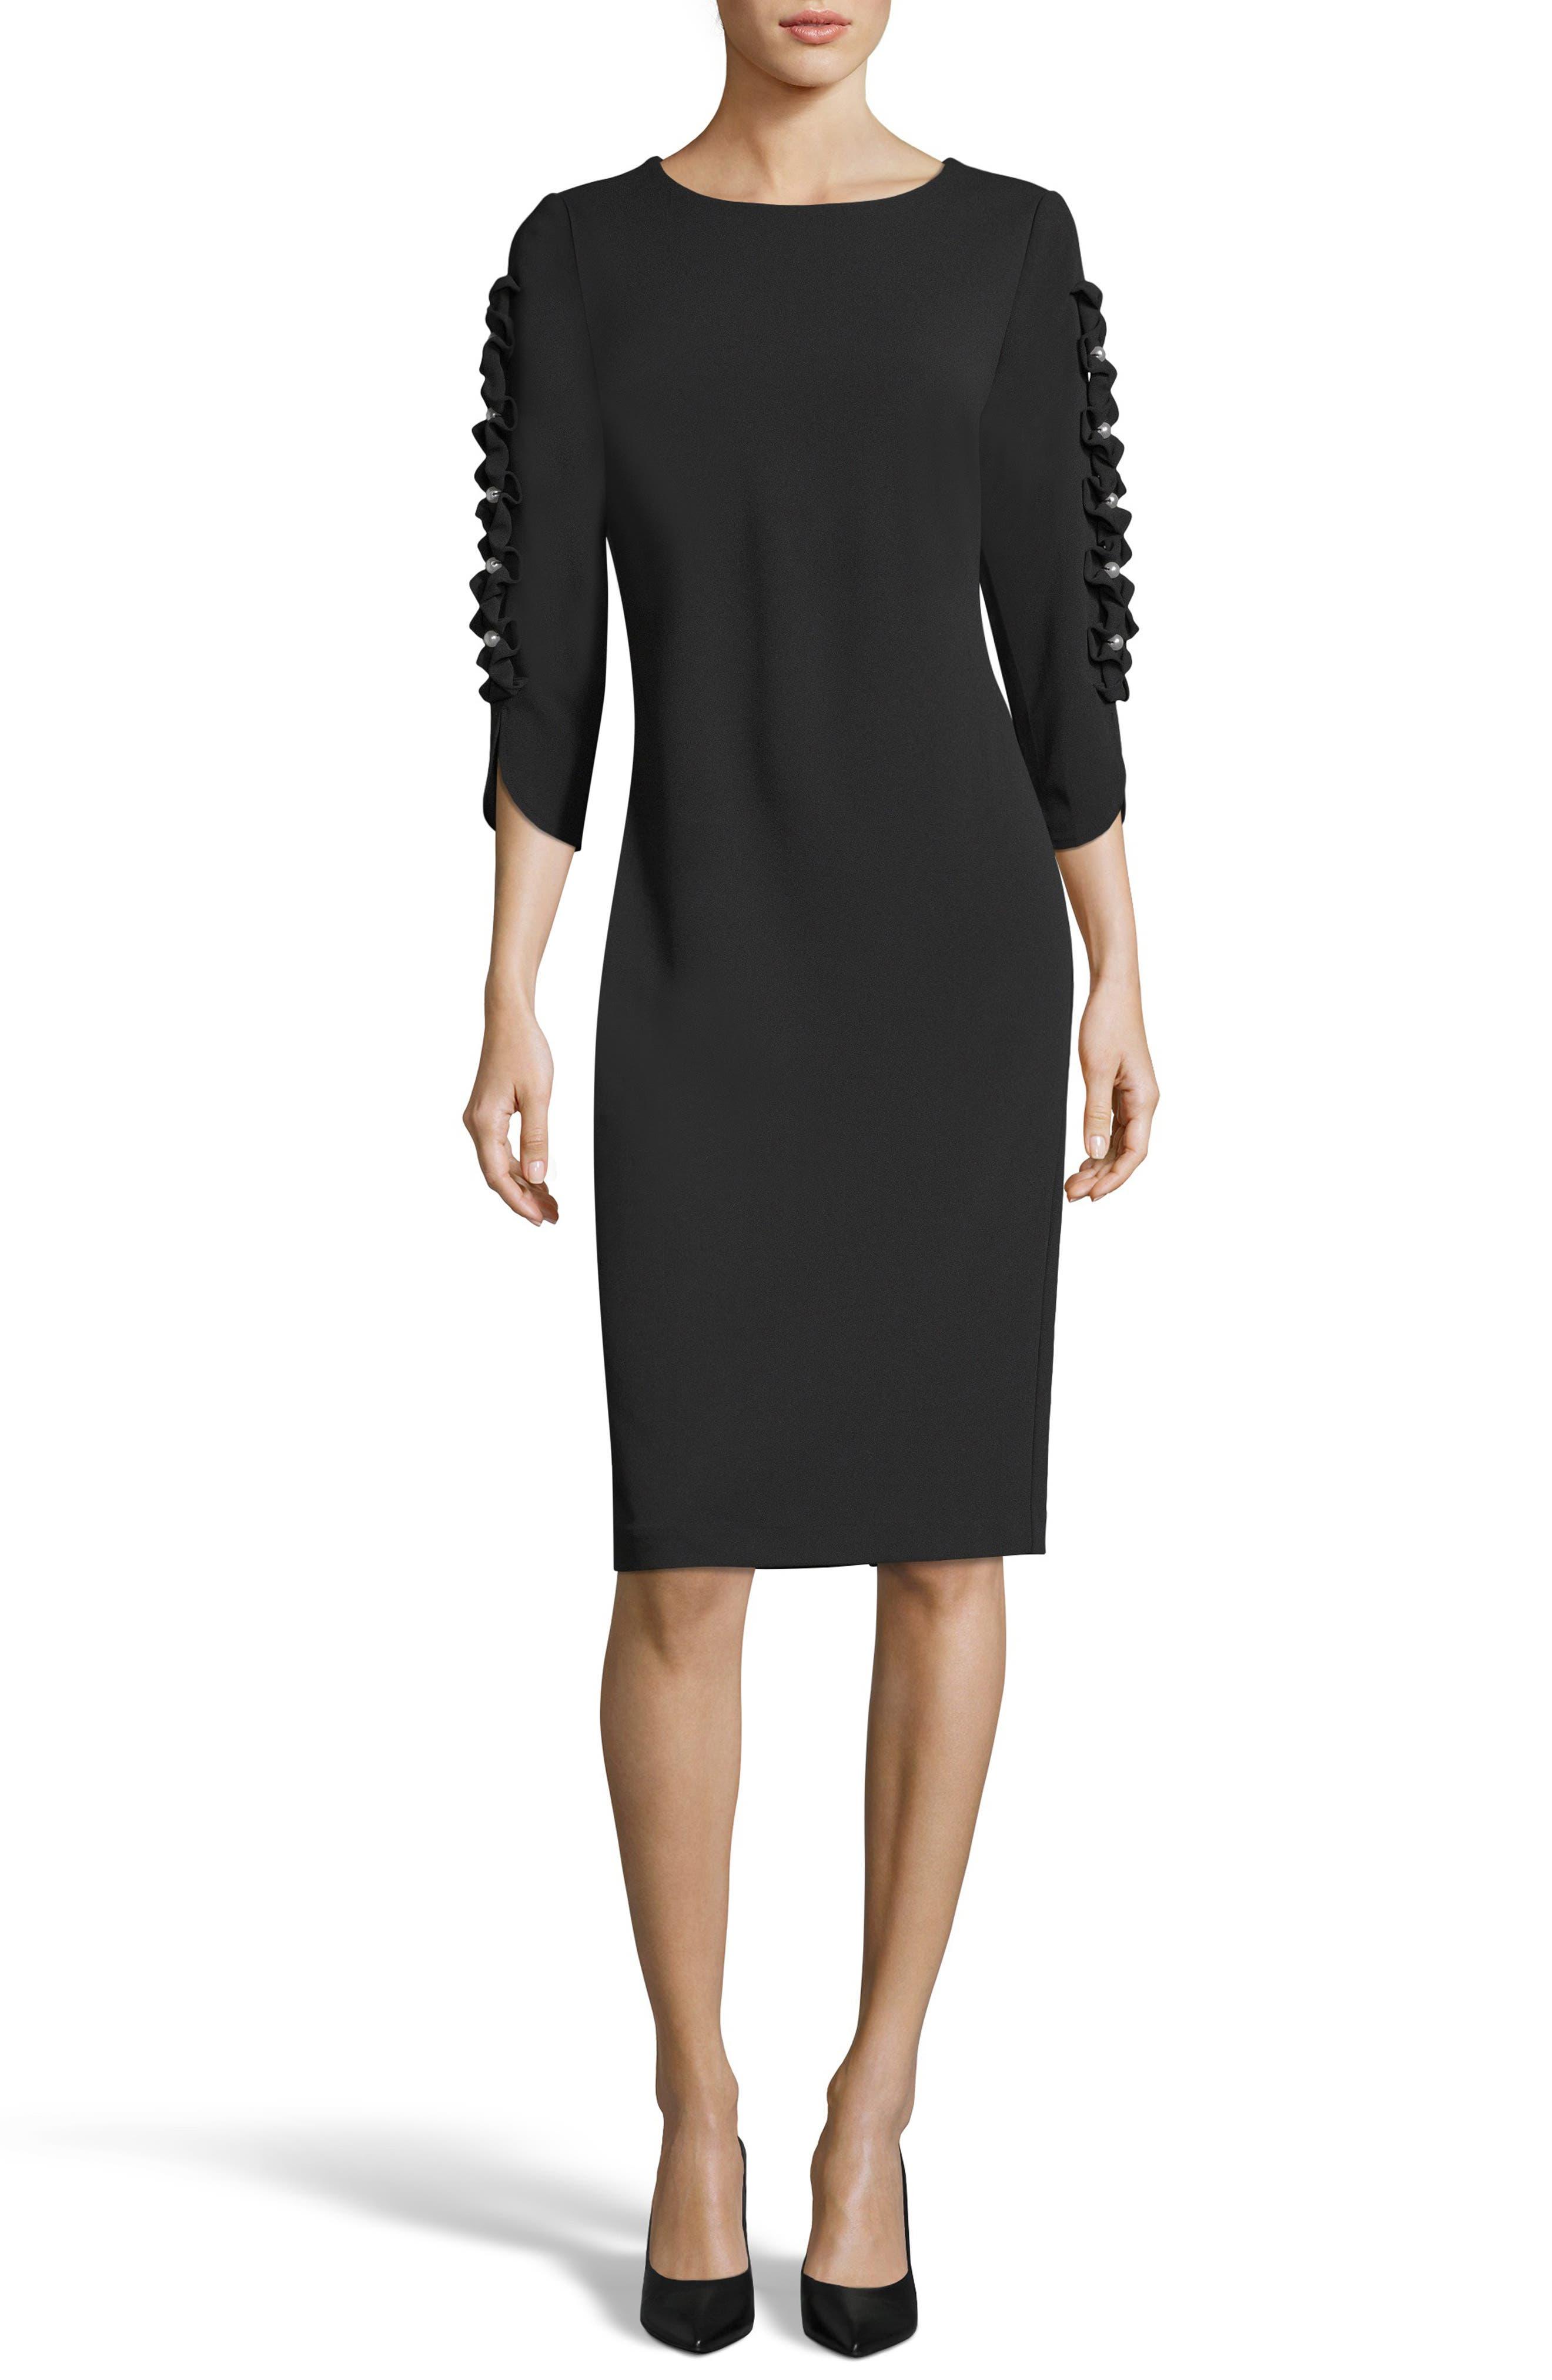 Eci Ruffle Sleeve Sheath Dress, Black